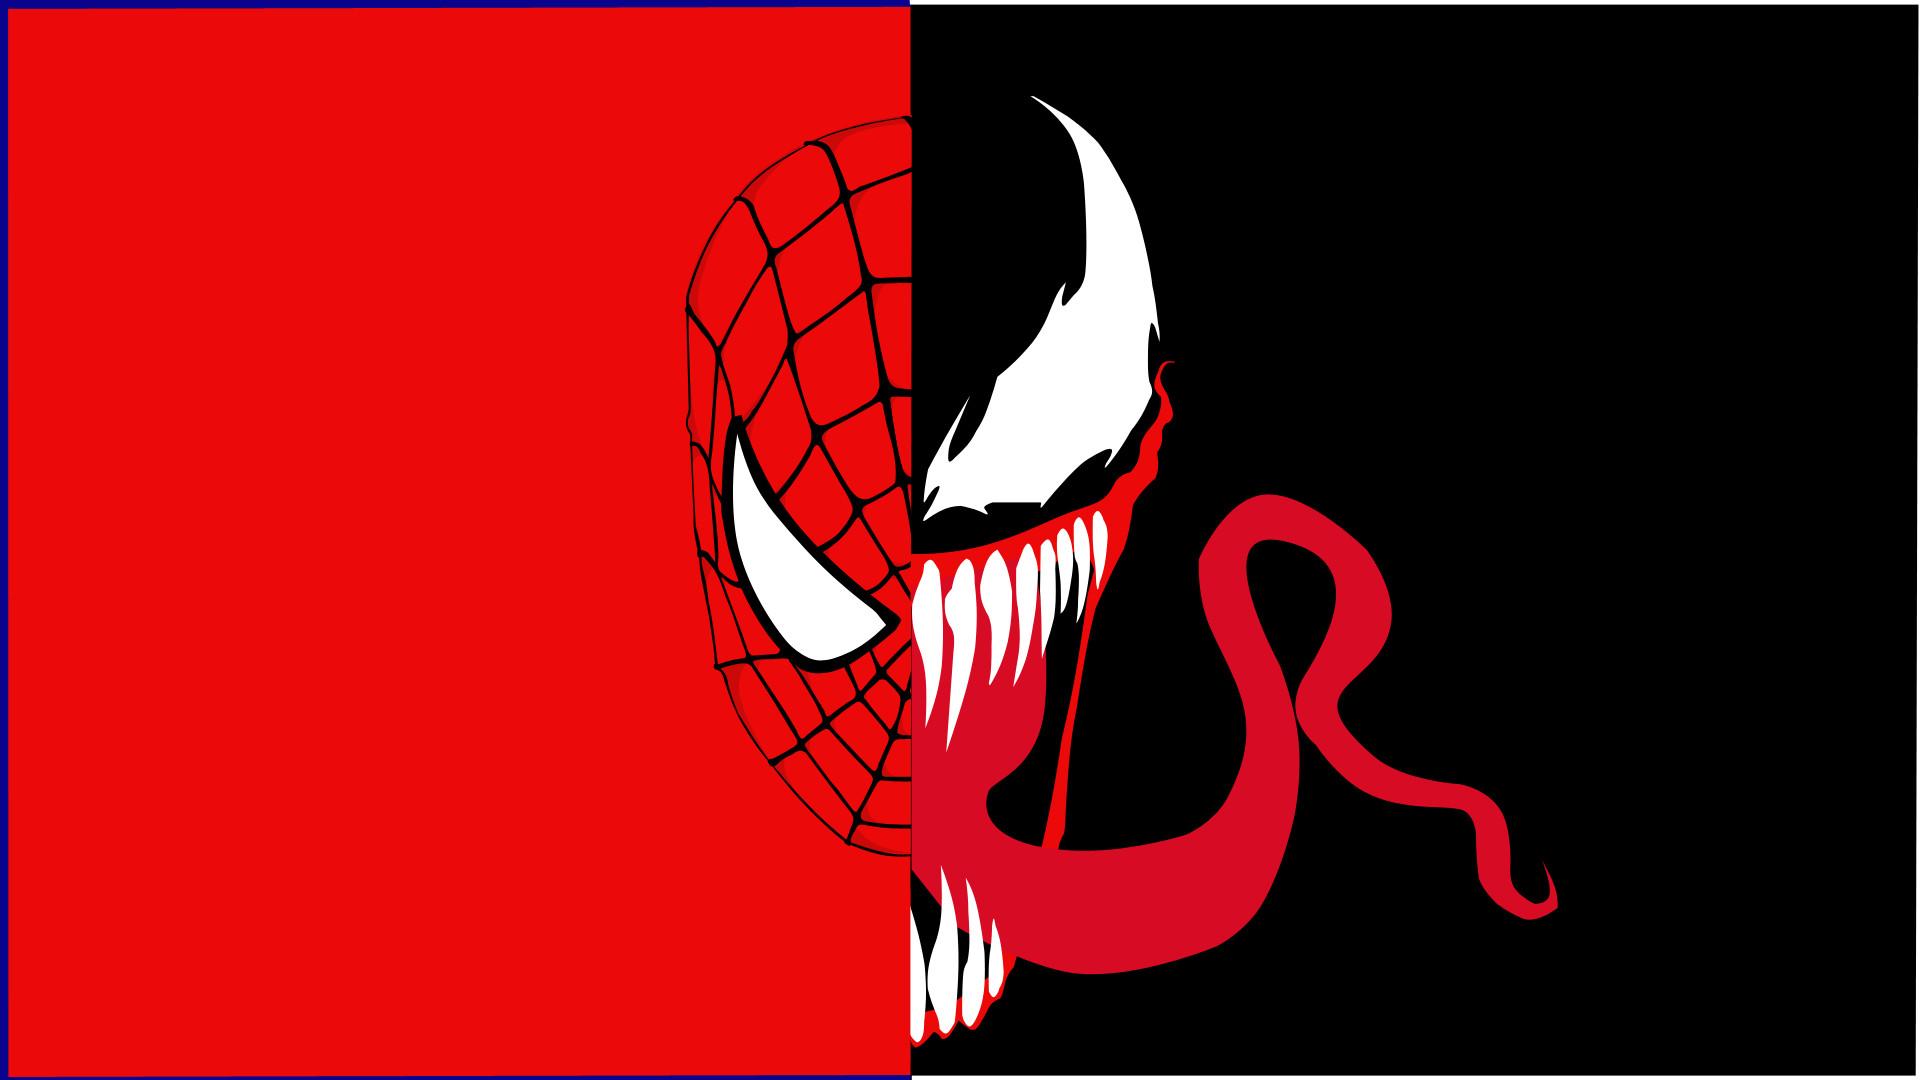 Spiderman Venom Wallpapers – Wallpaper Cave